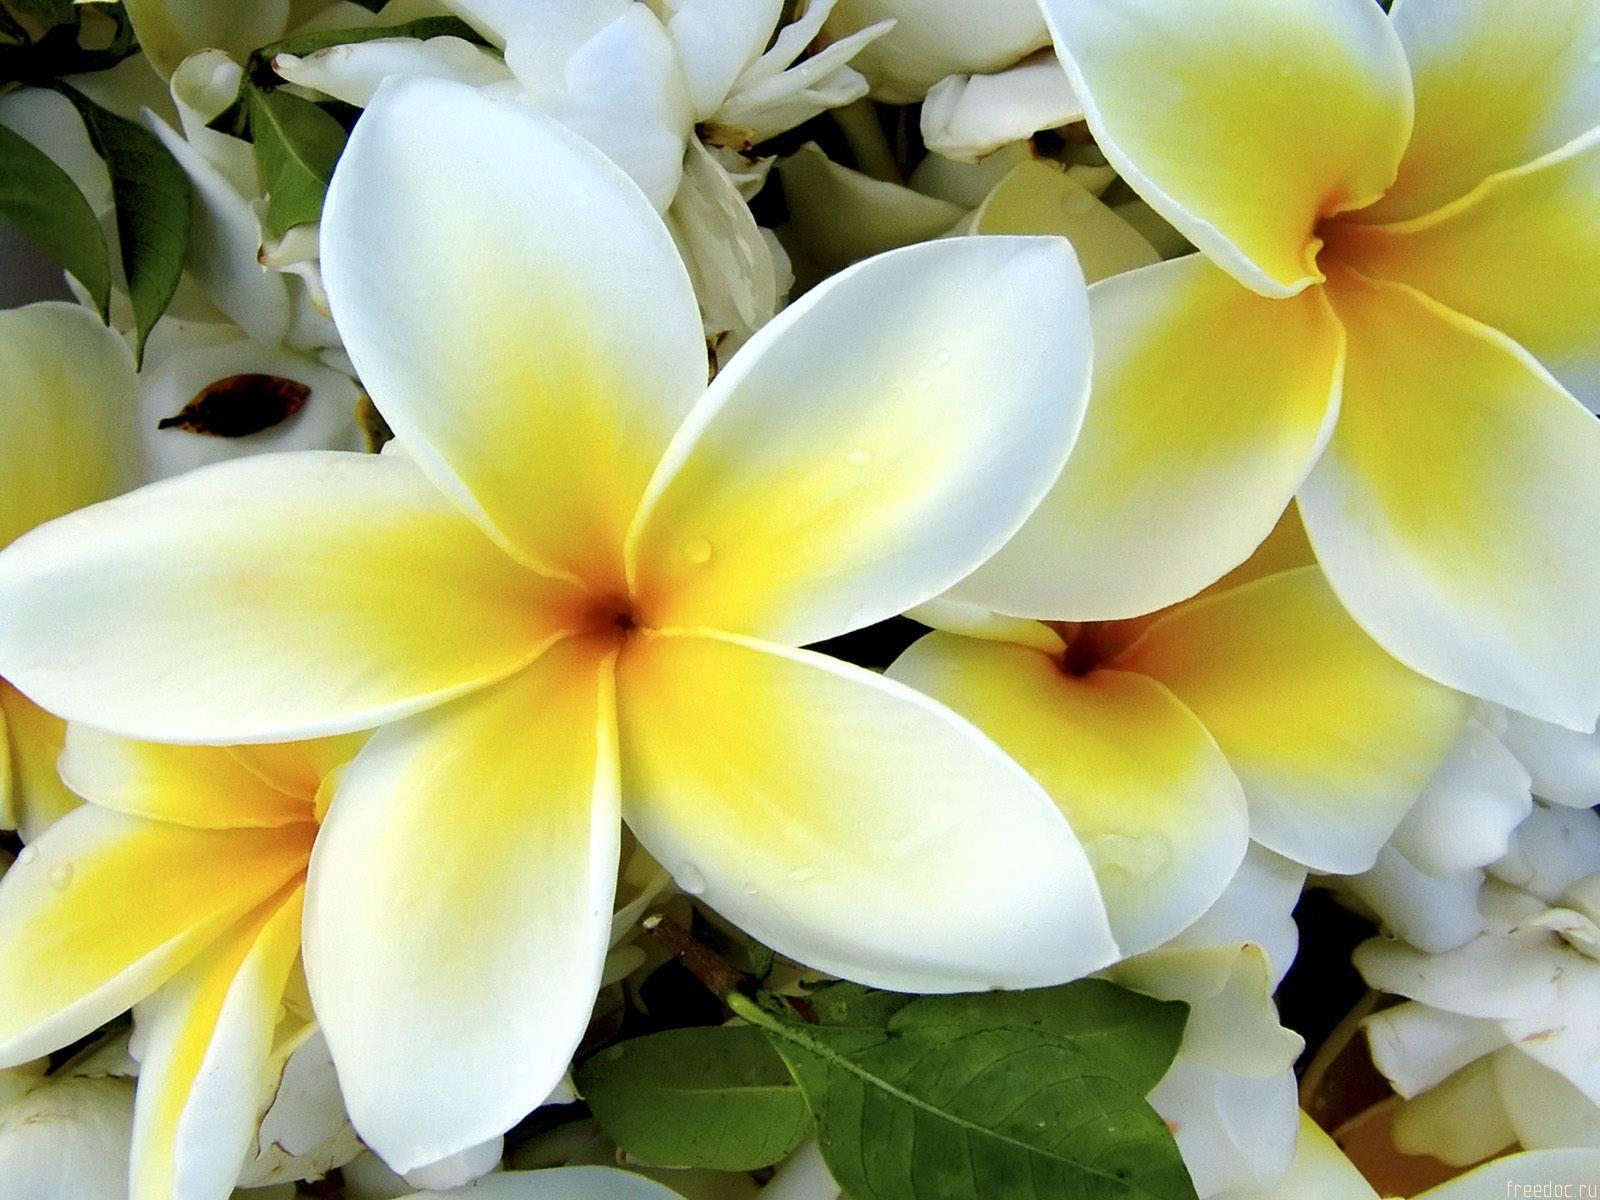 Ratnasrishindu Sevasamaj Beauty Full Flowers 80